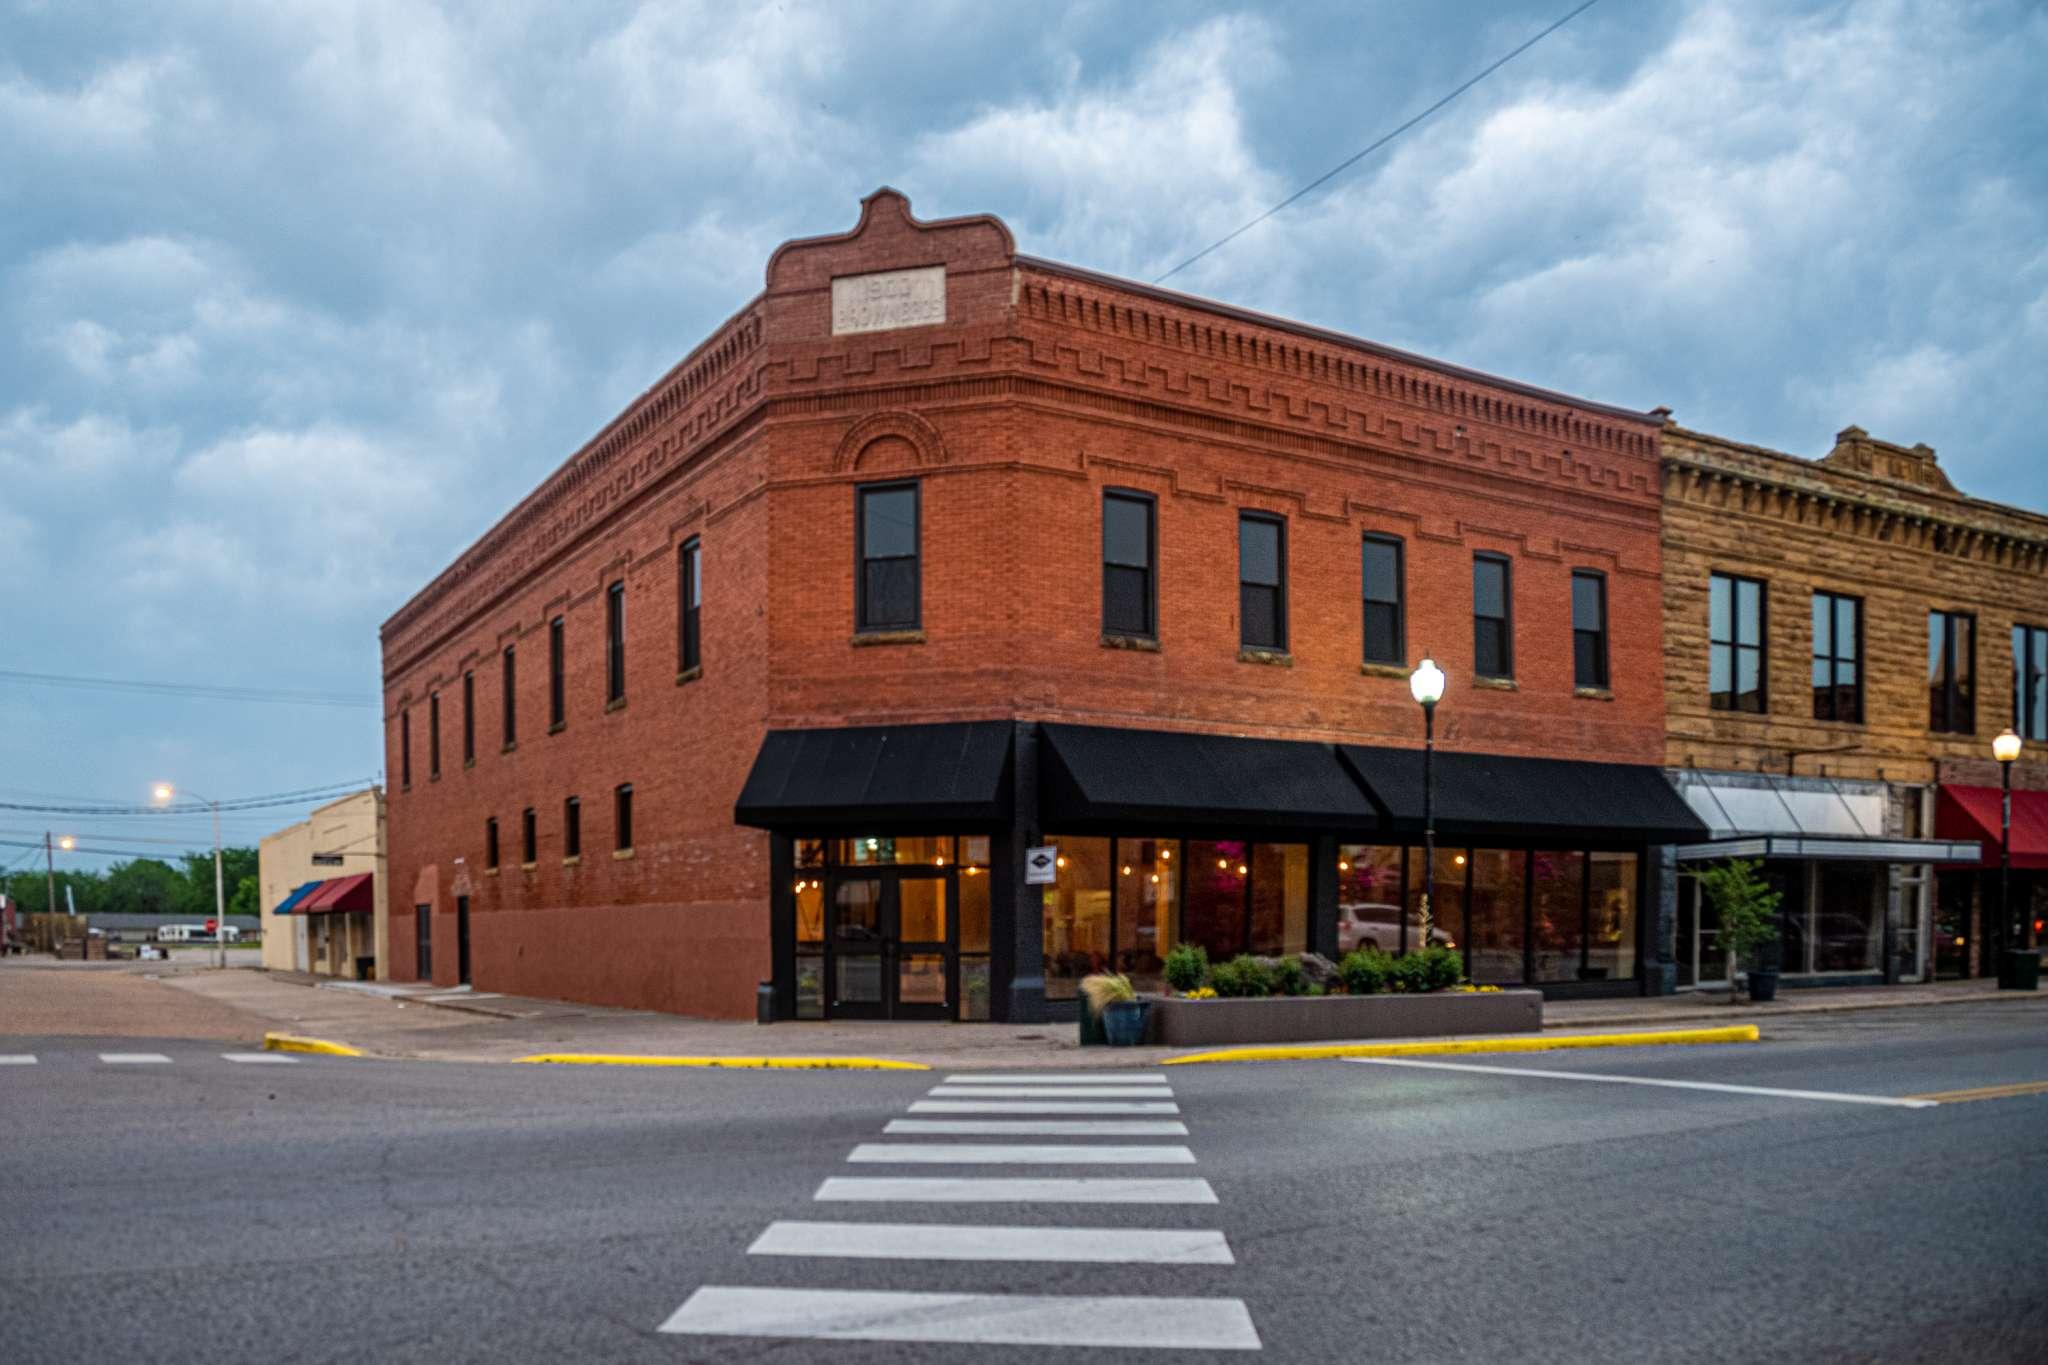 Eufaula, Oklahoma Historic Downtown Architecture Restaurant